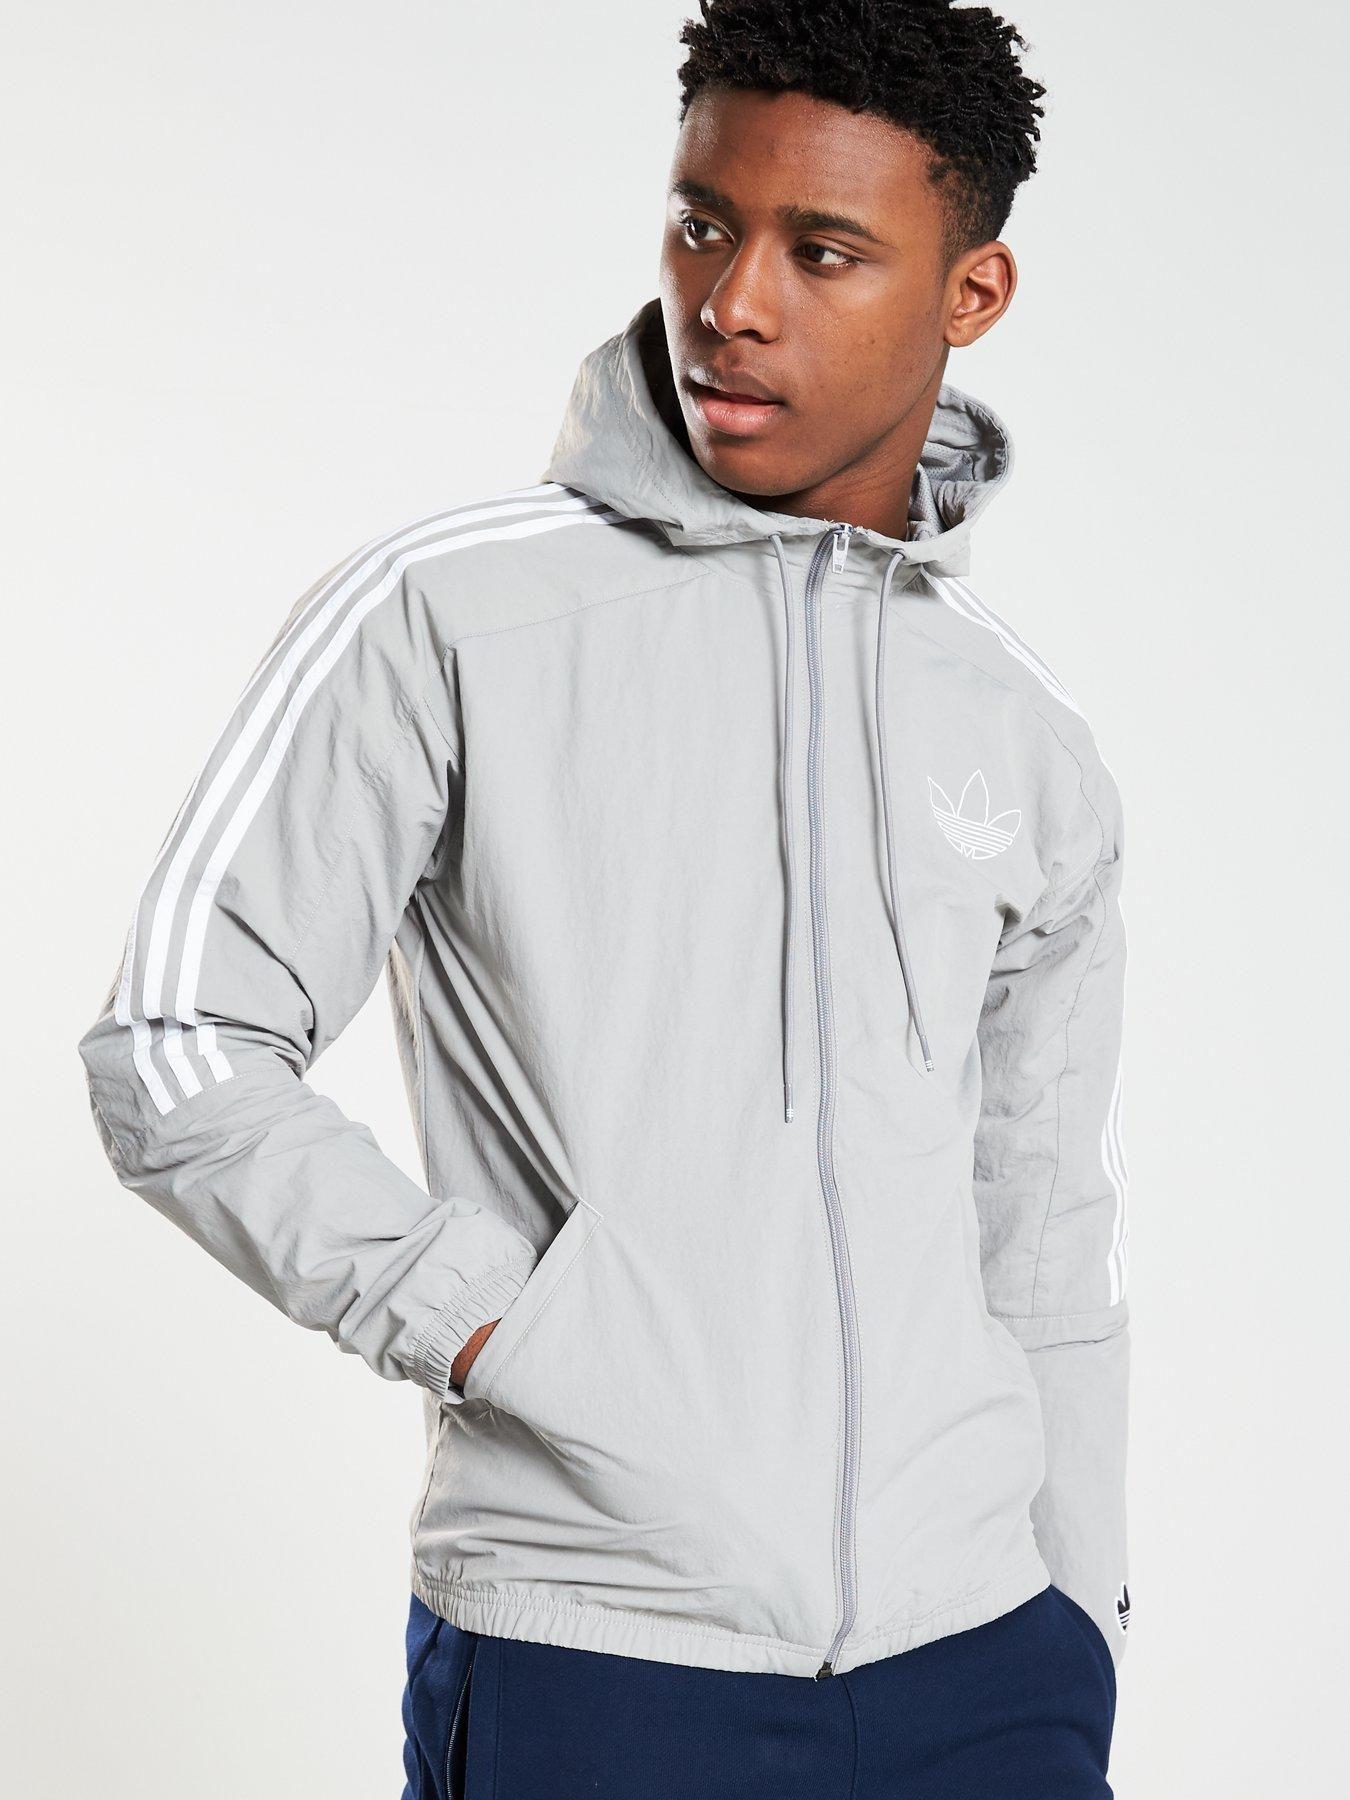 adidas Classic Trefoil Sweatshirt Men medium grey heather